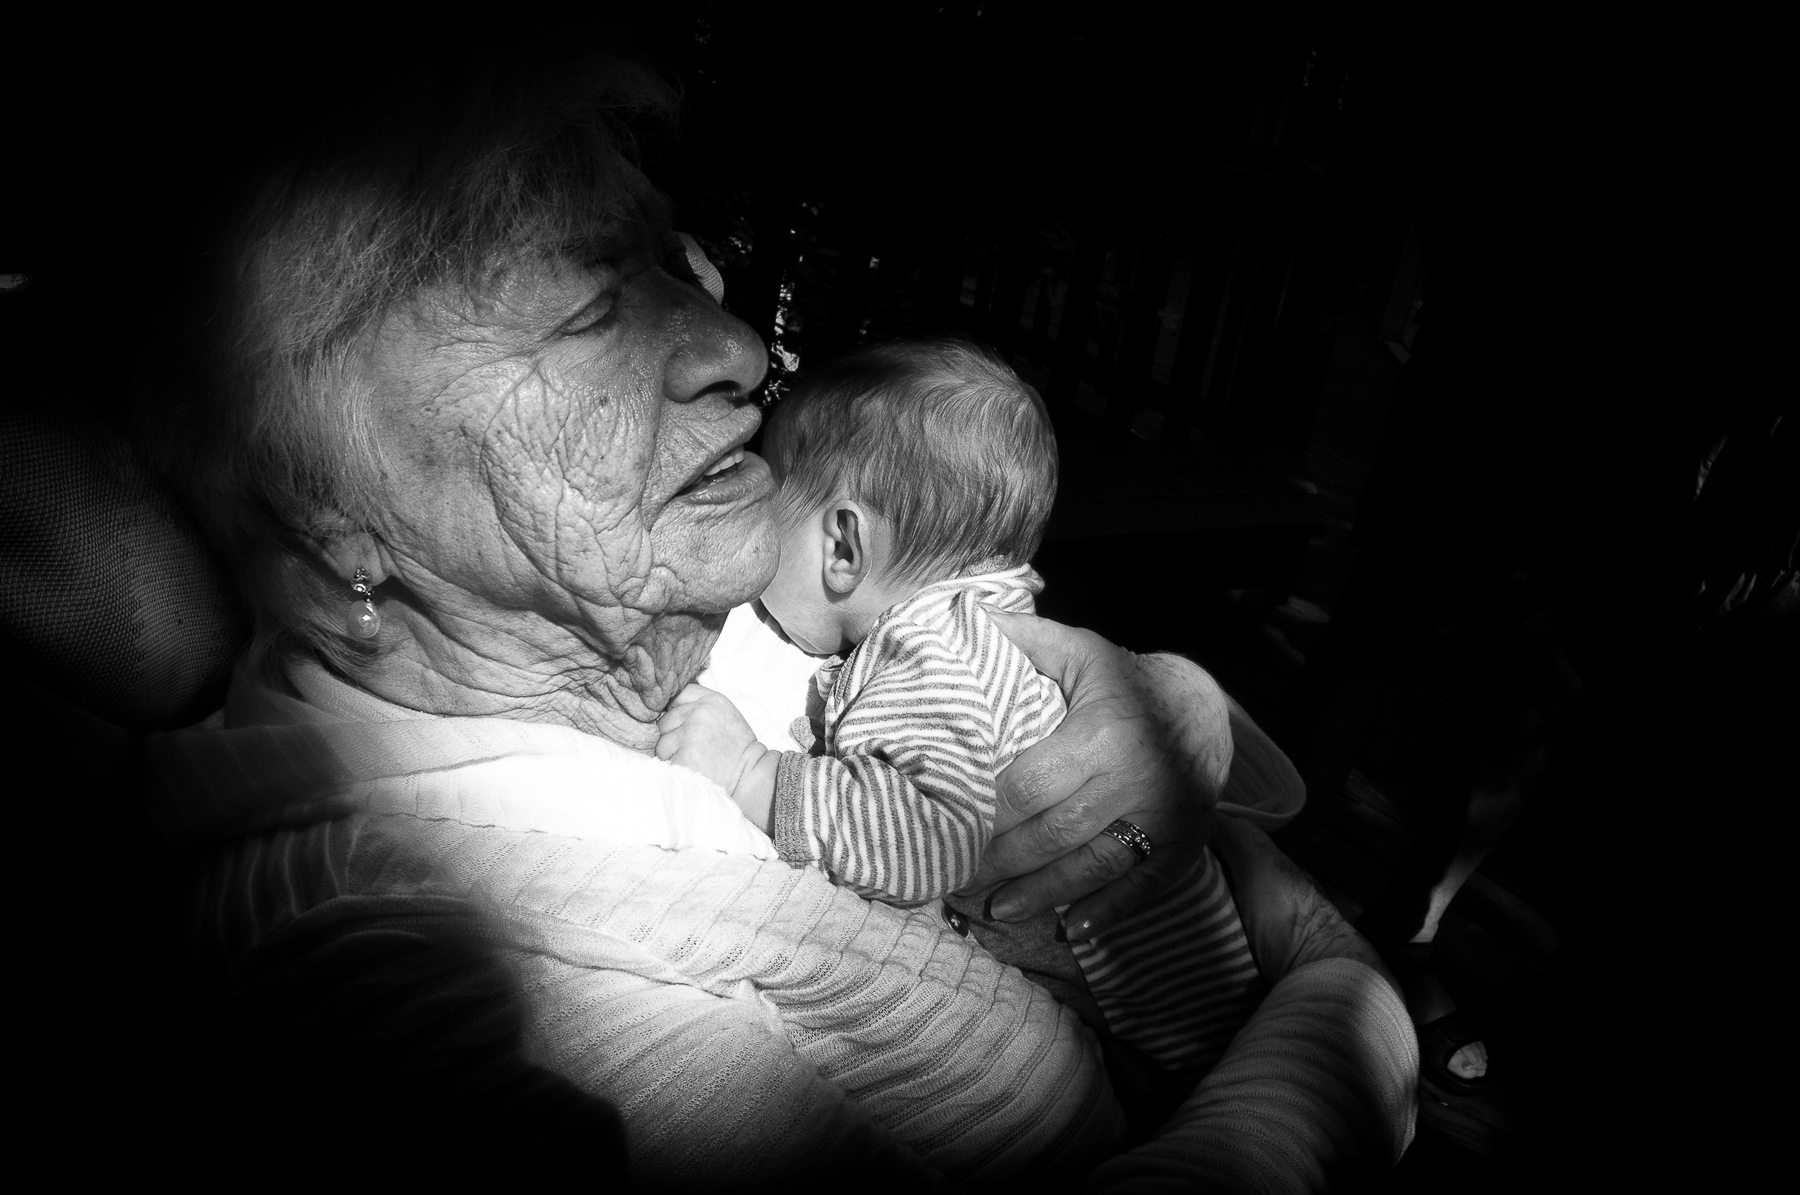 Beata Wolniewicz_Holding the fourth generation.jpg